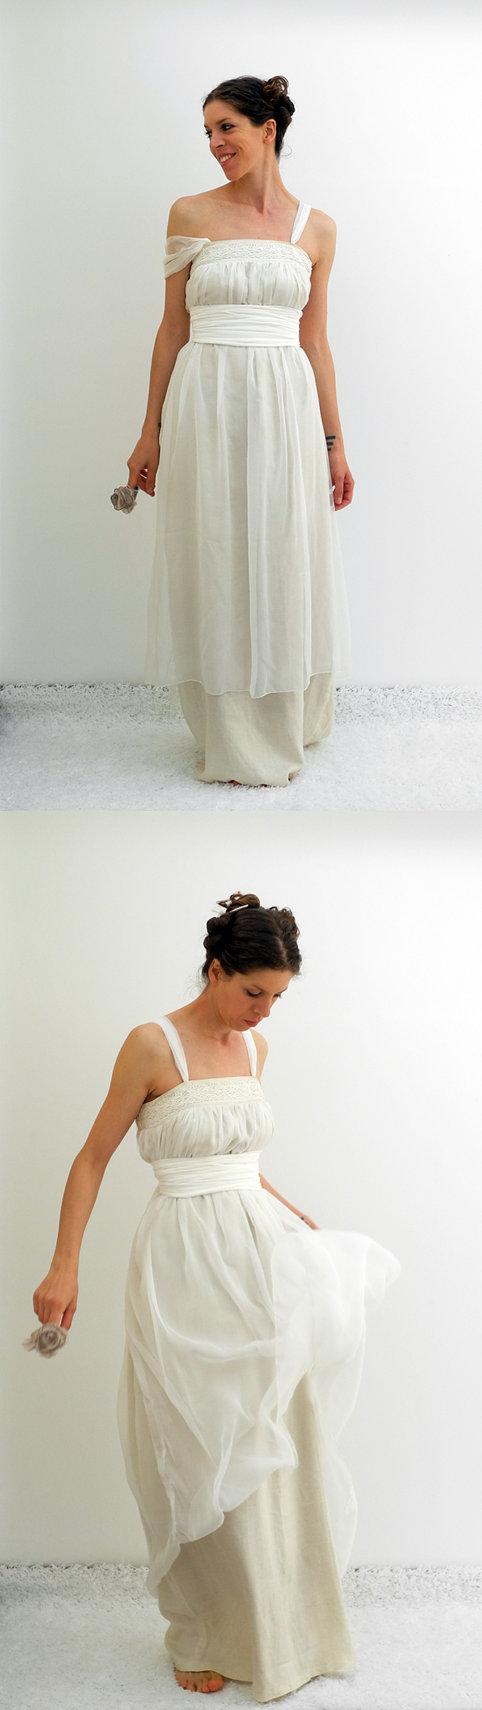 Custom dress for daniela wedding gown boho formal dress